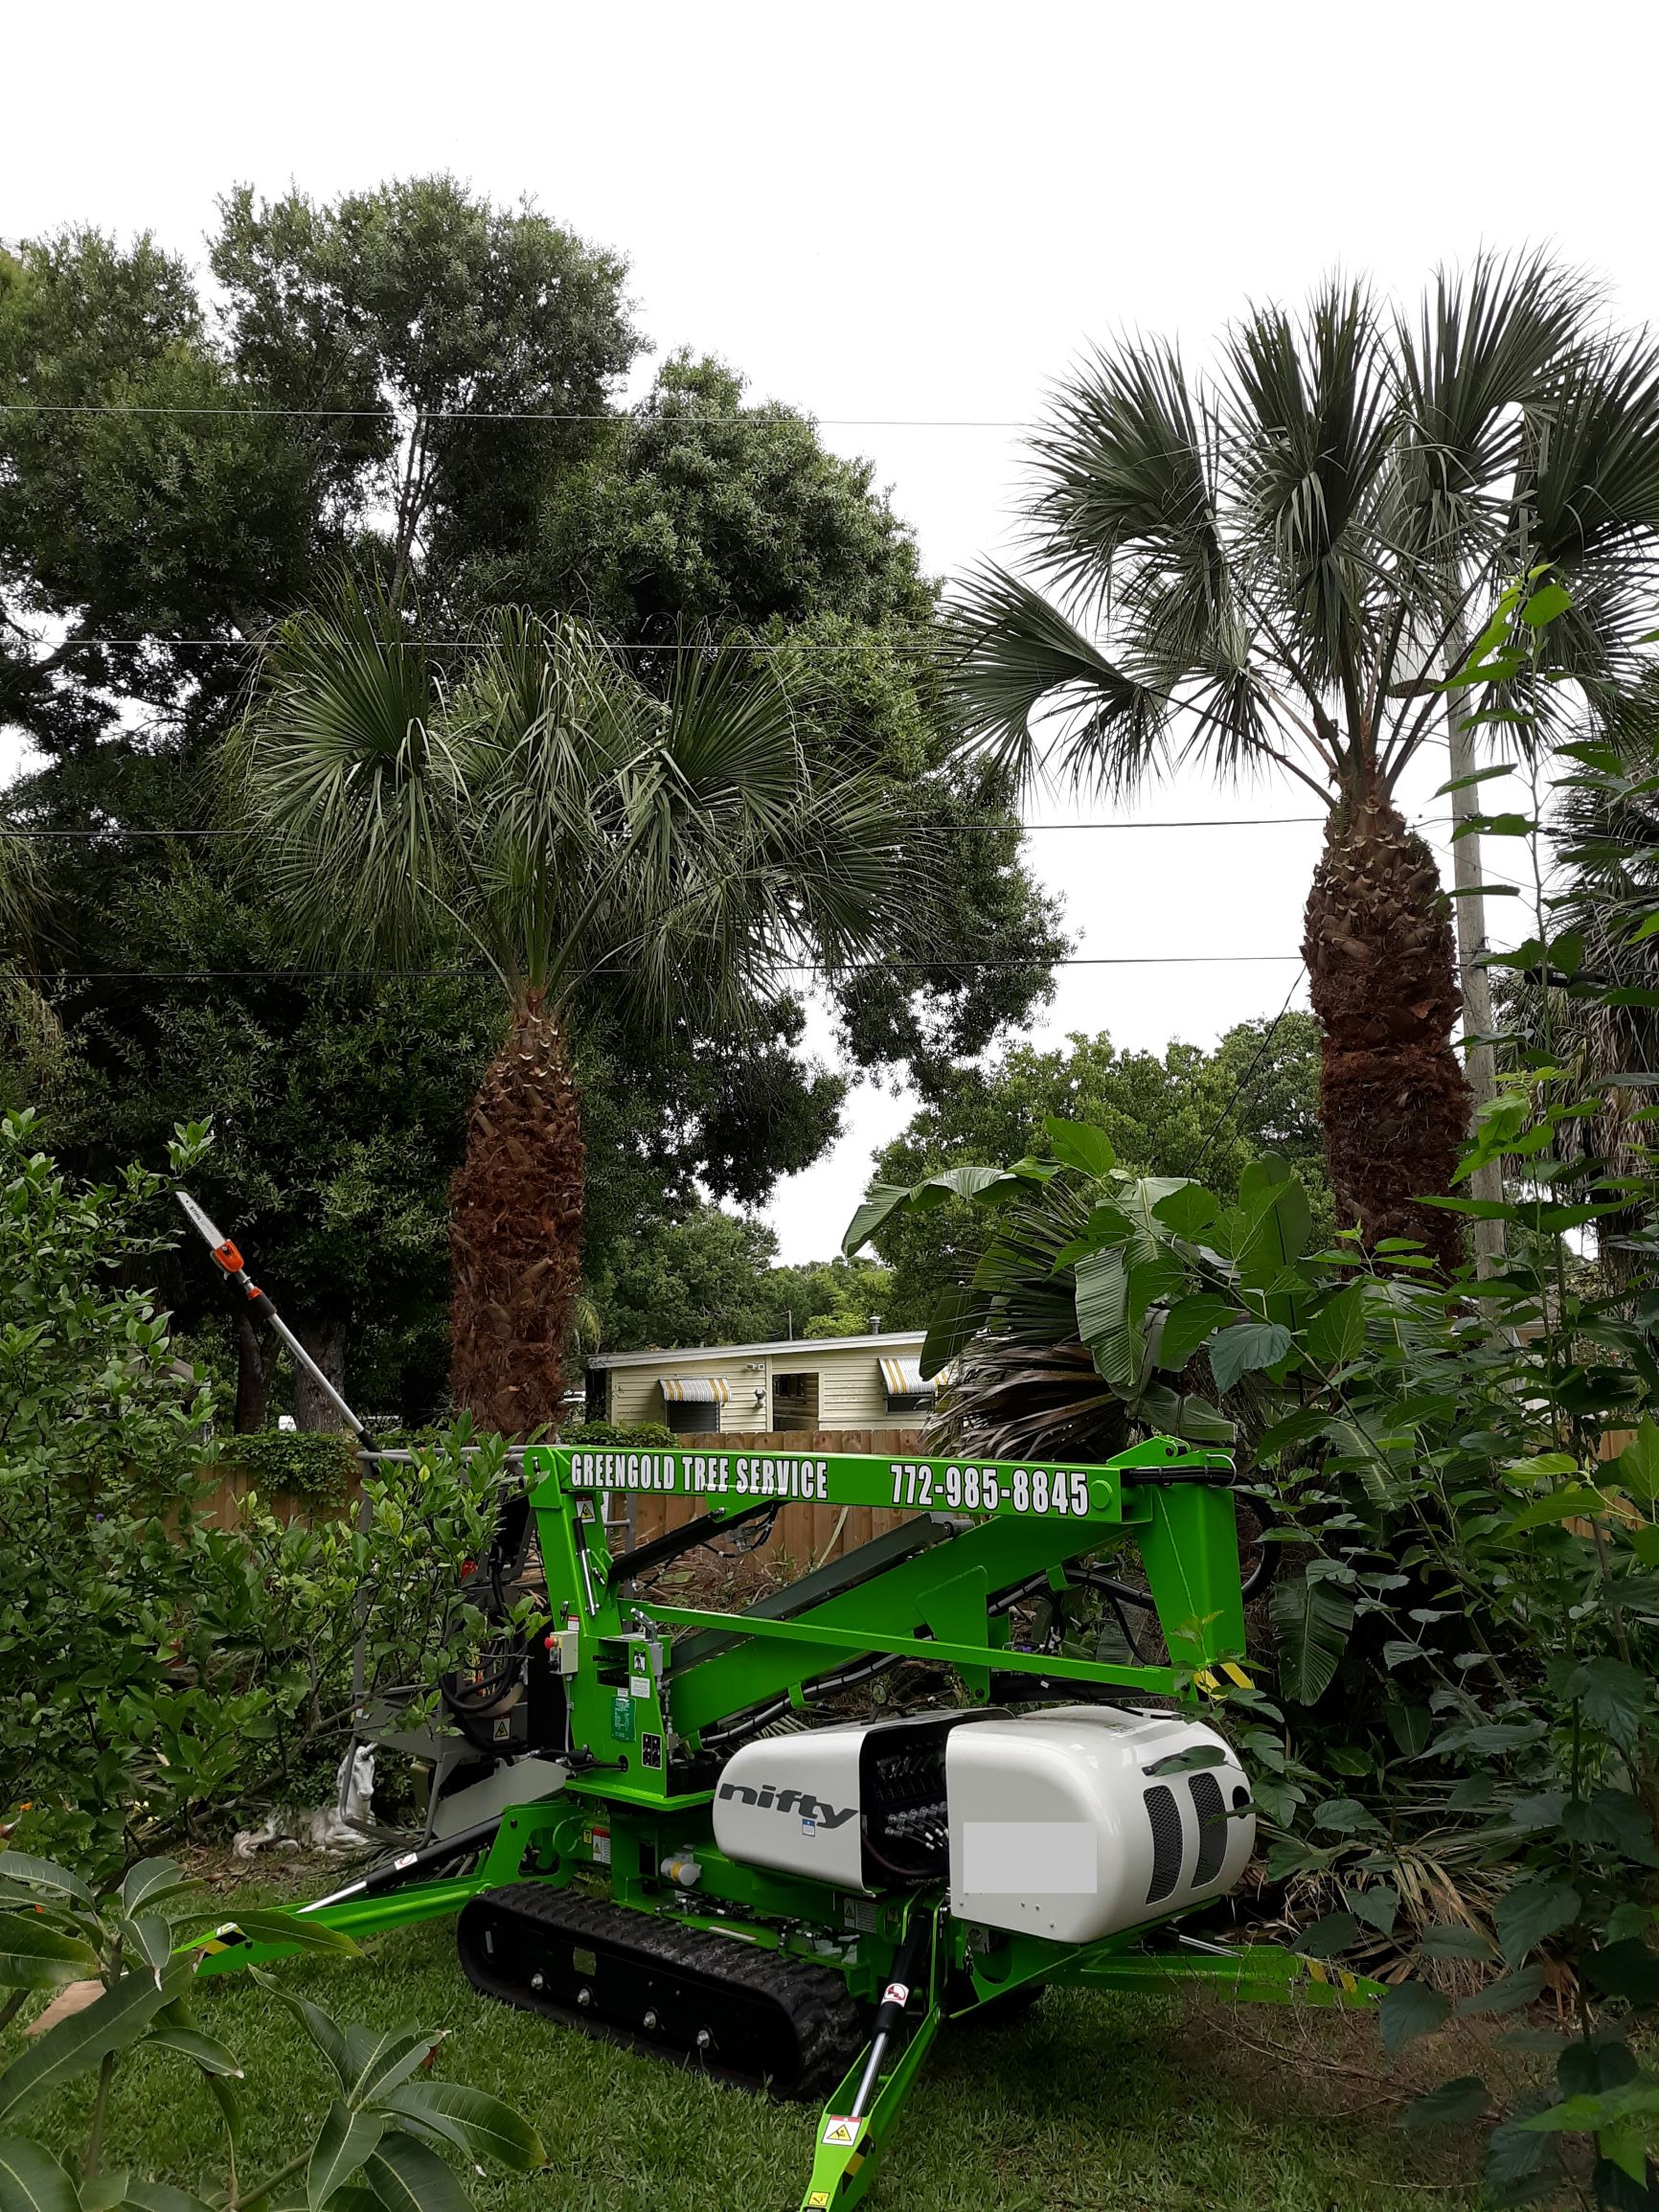 Greengold Tree Service - Port St. Lucie, FL 34983 - (772)985-8845 | ShowMeLocal.com